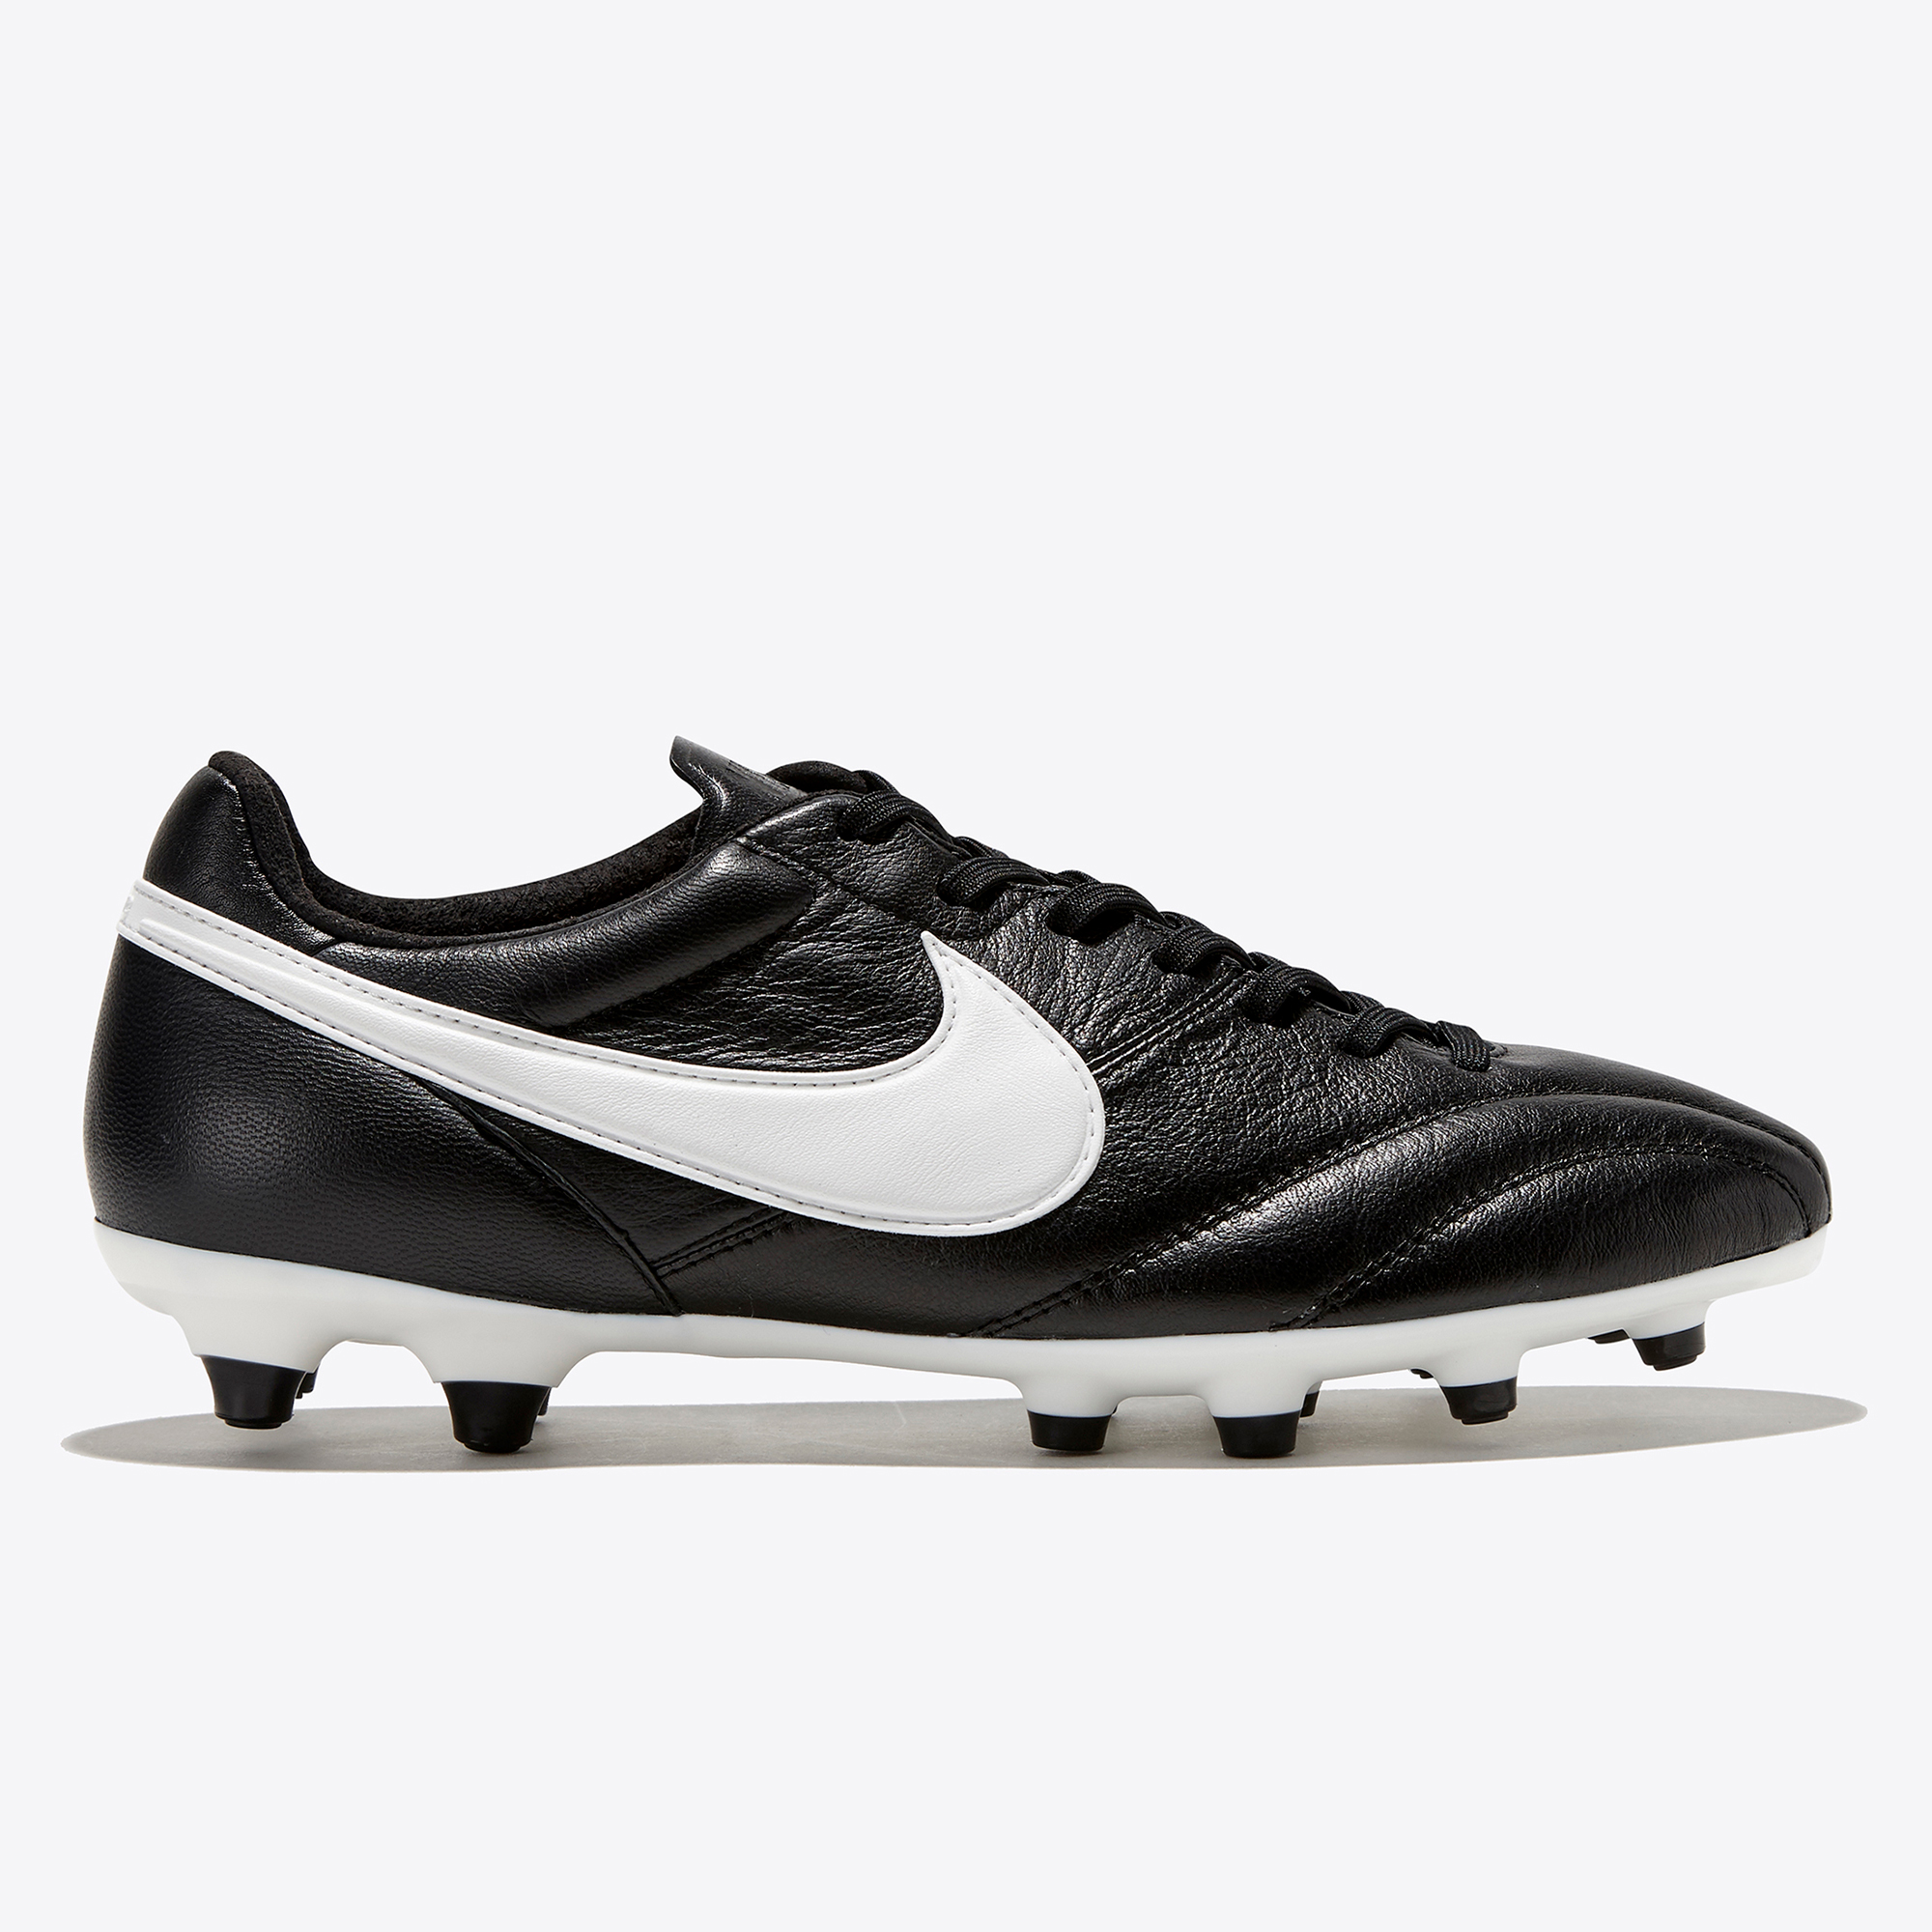 Nike Premier Football Boots Black